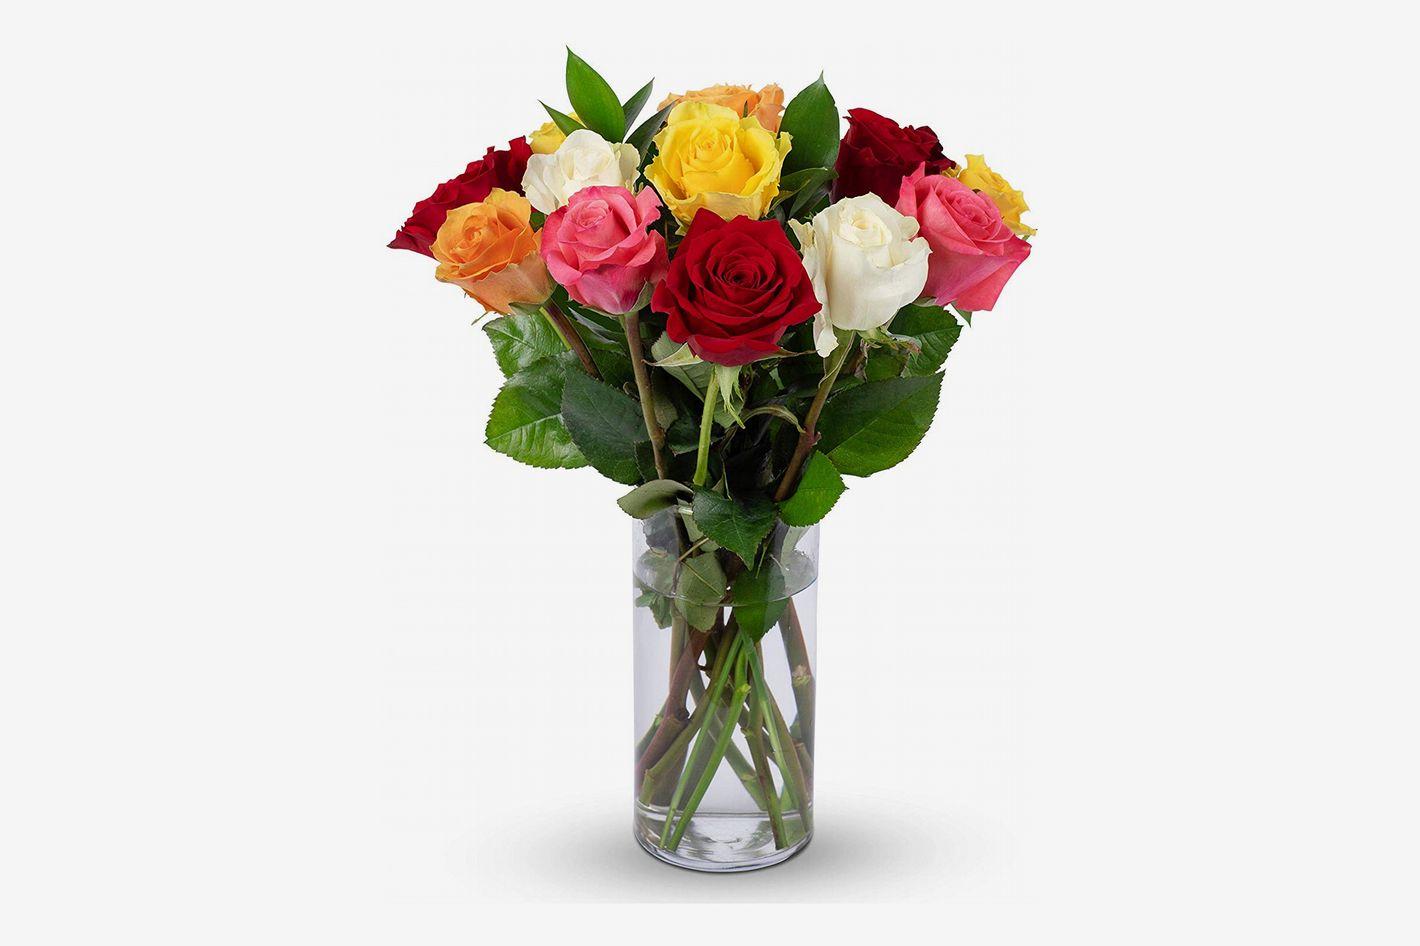 Benchmark Bouquets Dozen Rainbow Roses With Vase